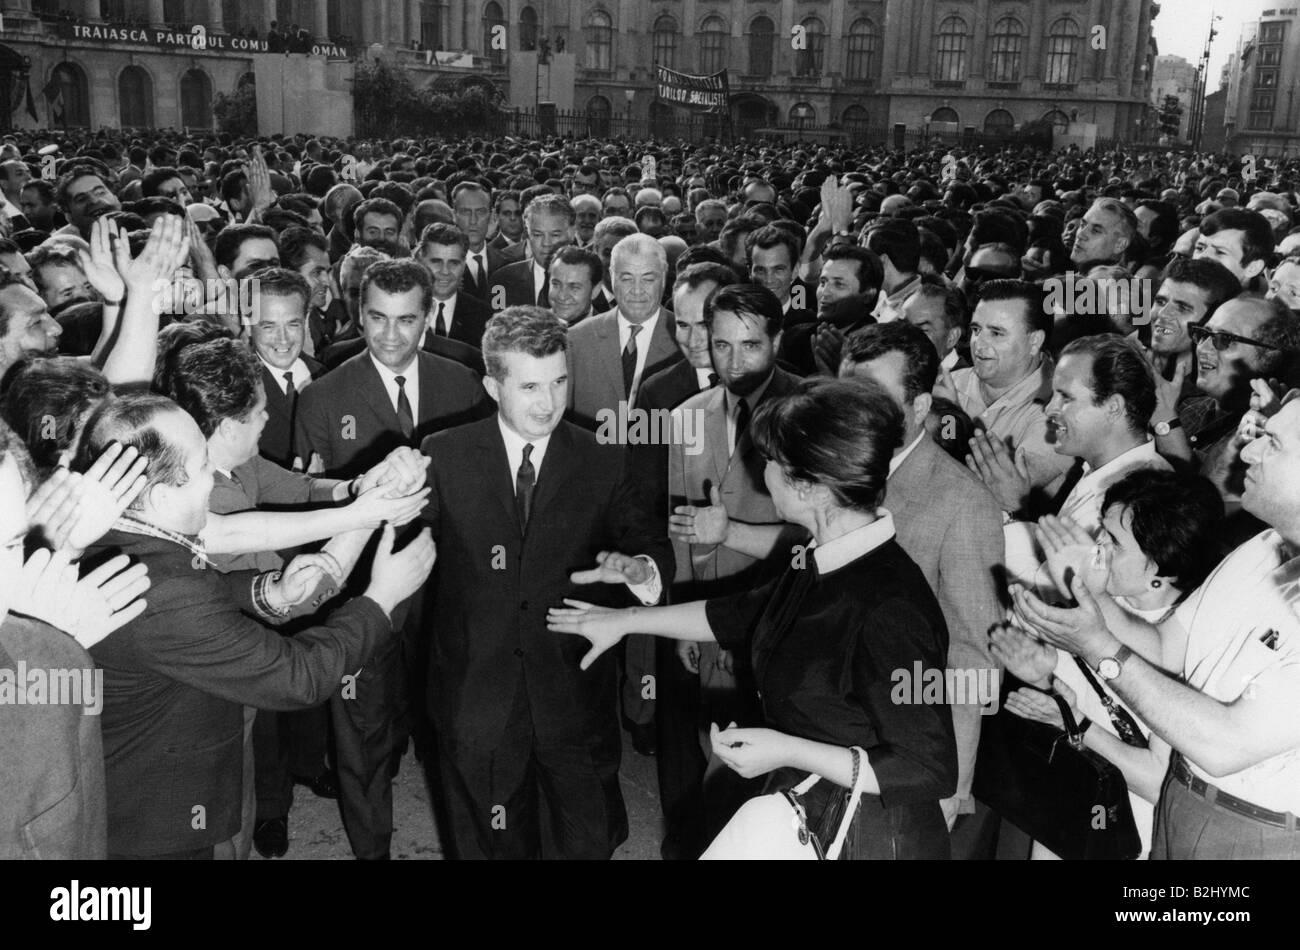 Ceausescu, Nicolae, 26.1.1918 - 25.12.1989, Romanian politician (PCR), President 22.3.1965 - 22.12.1989, bath inStock Photo